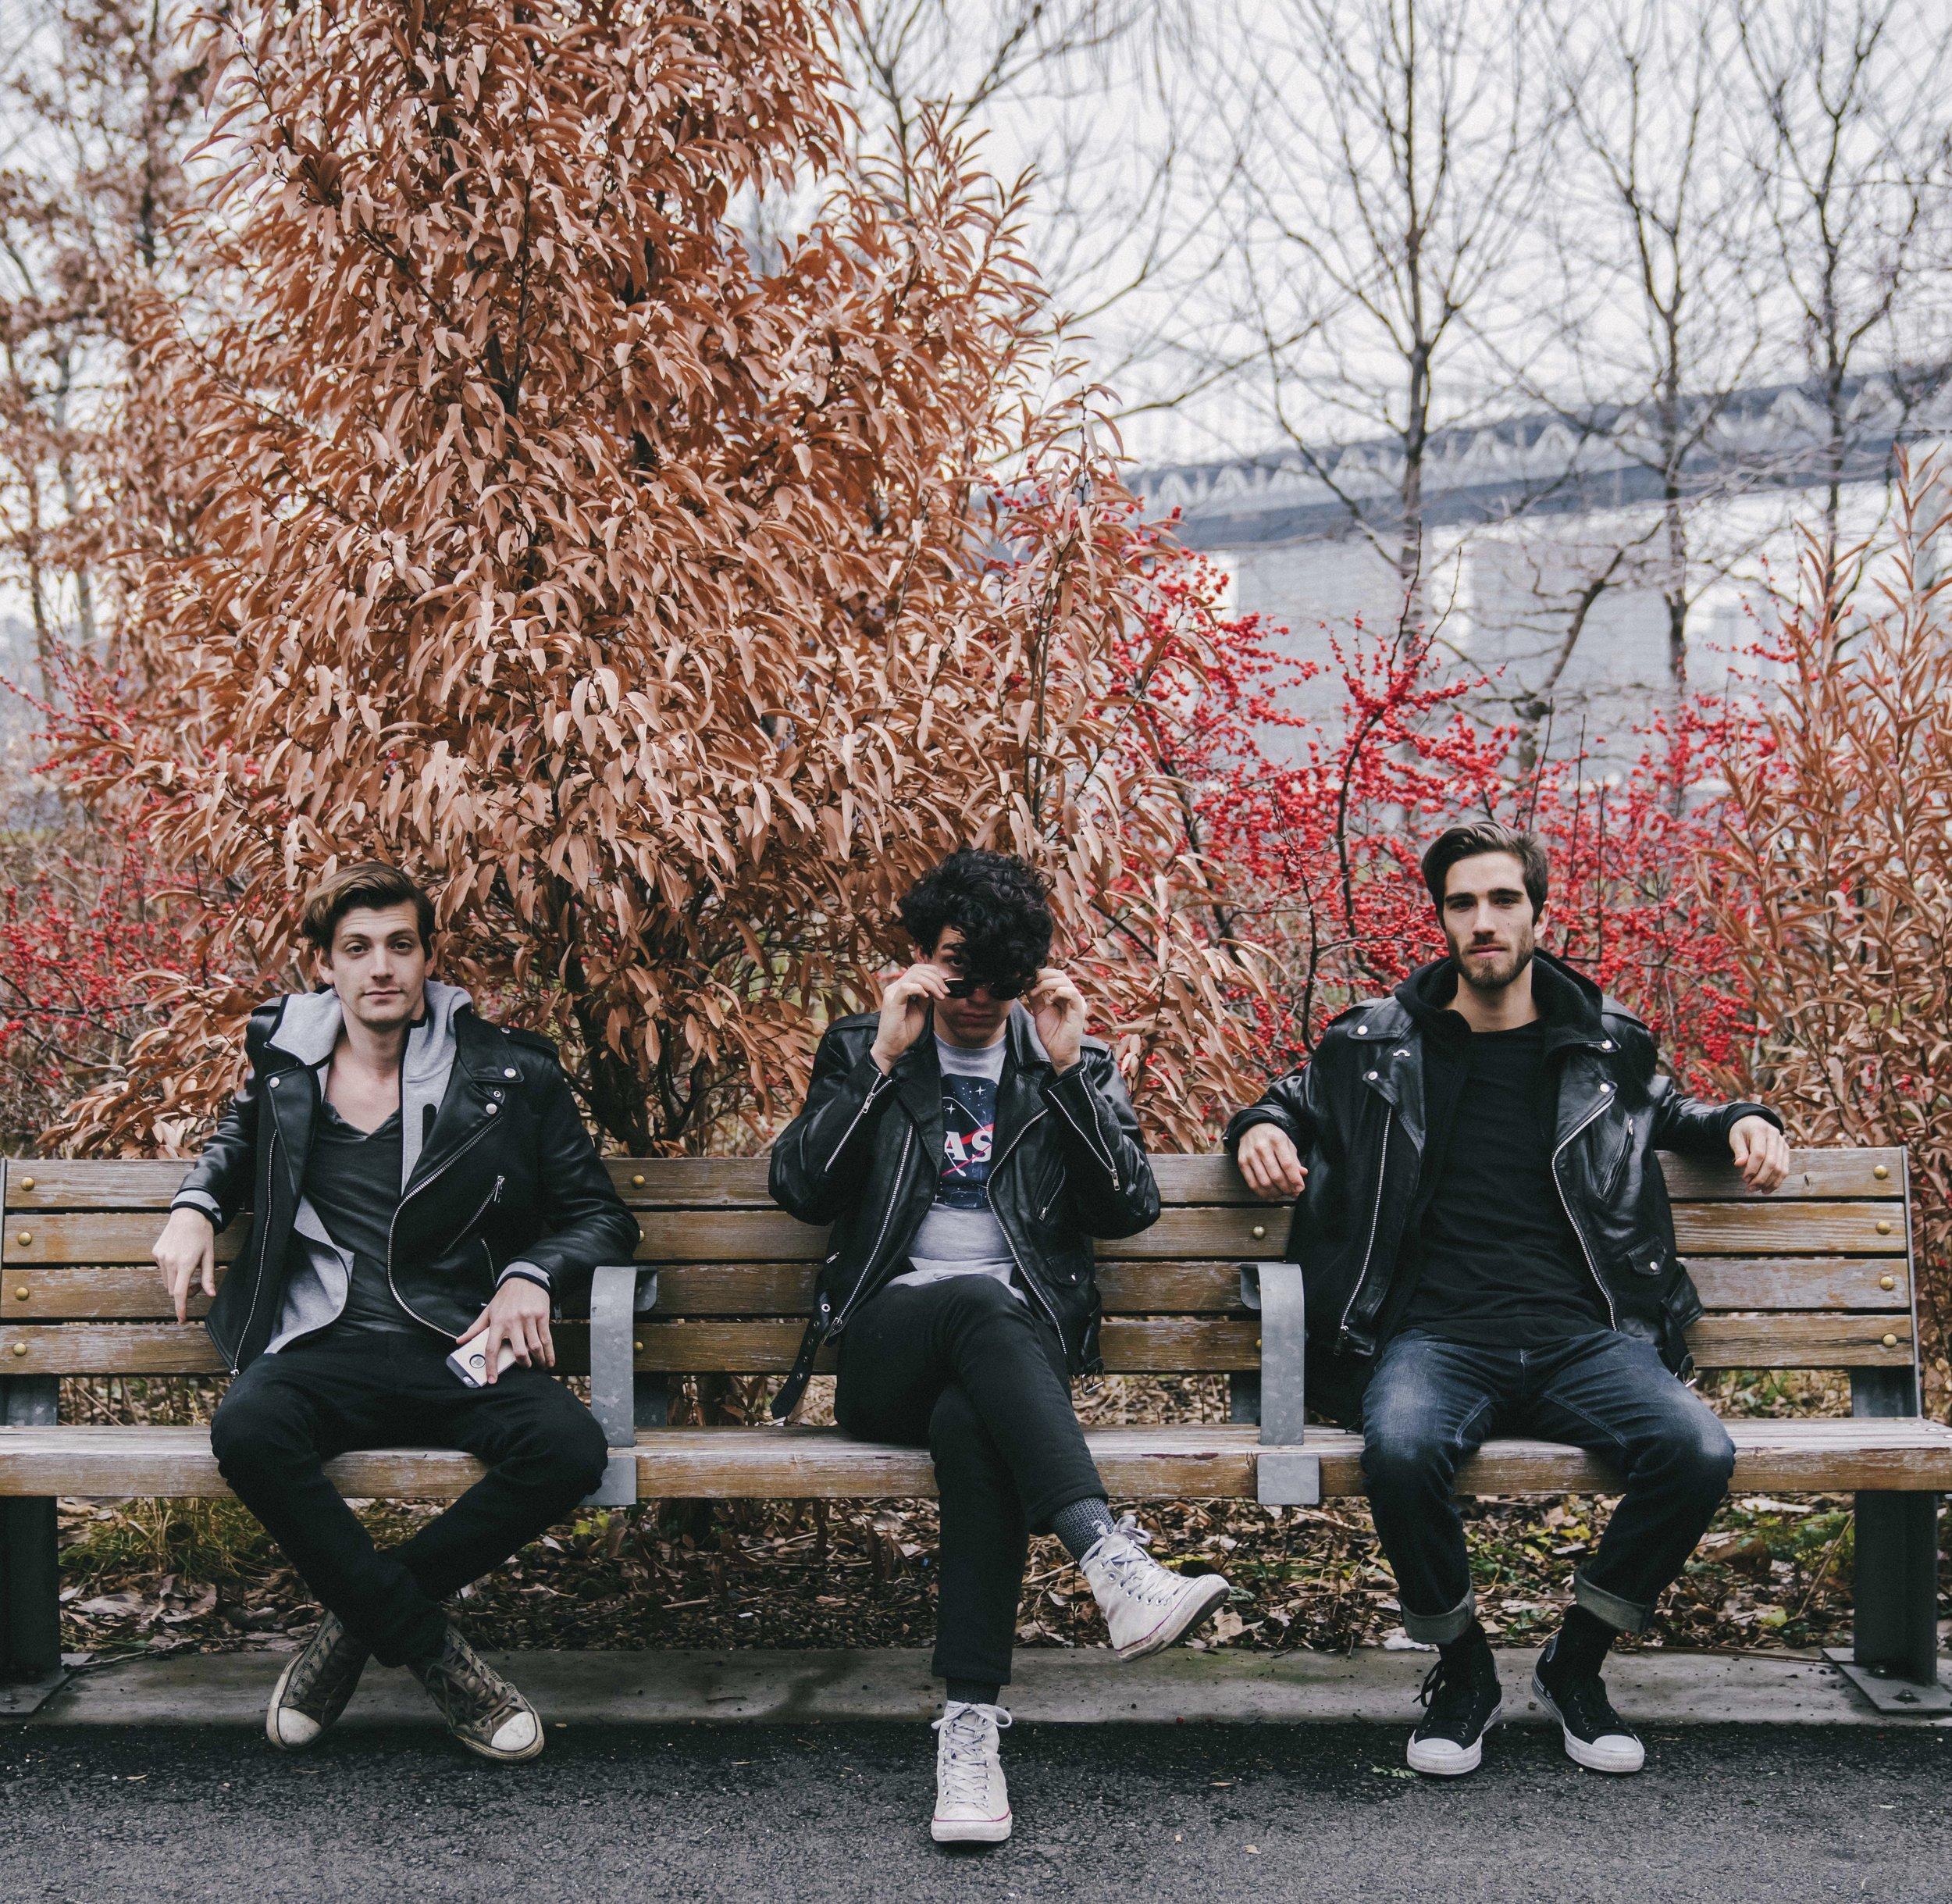 Guitarists: Avi Snow, John Pita & Percussionist Zach Para = City of the Sun